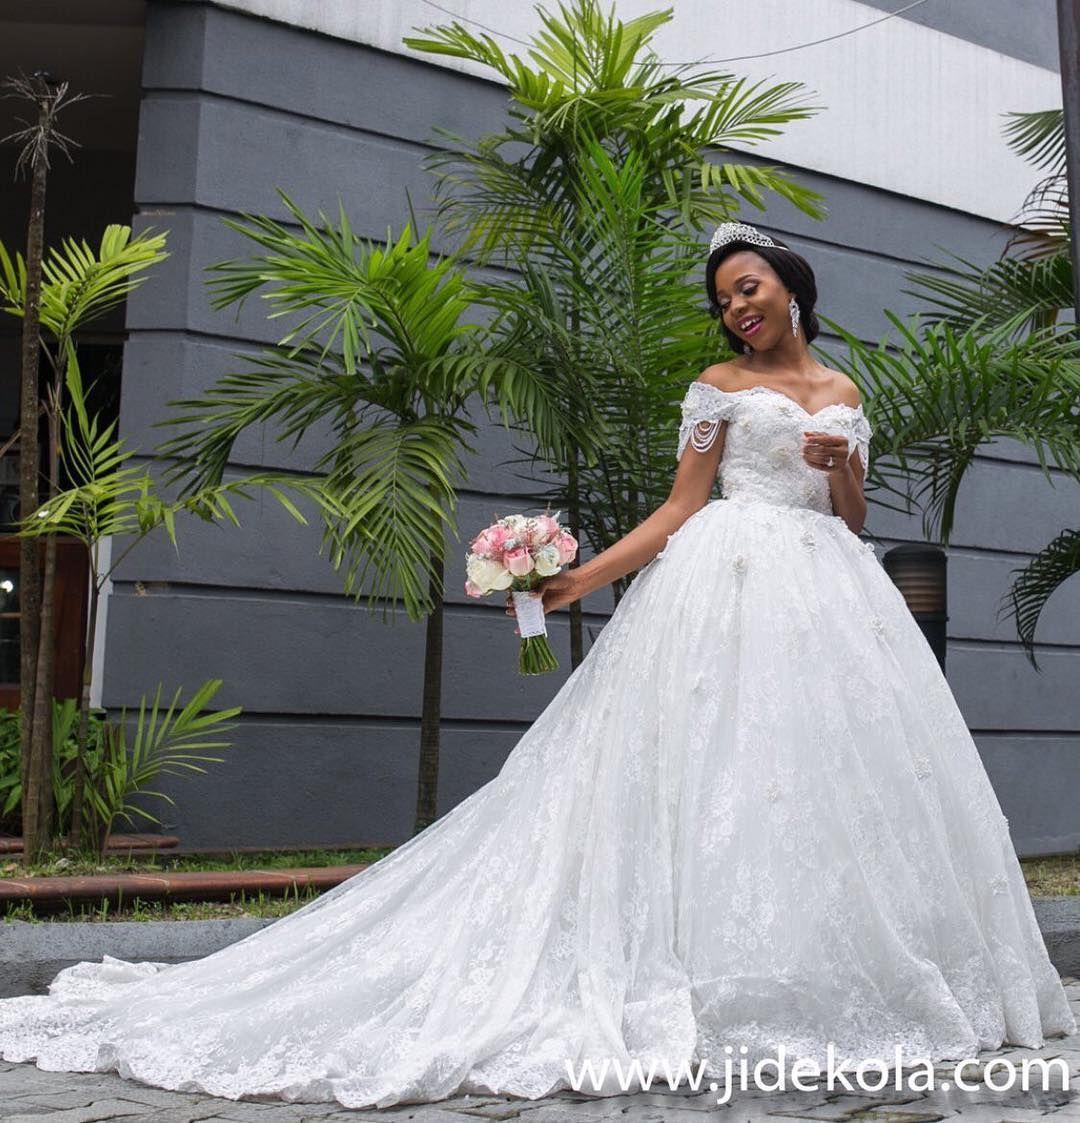 Happy Bride Congrats Kukyeem Wedding Planner Gleamzworldofevents